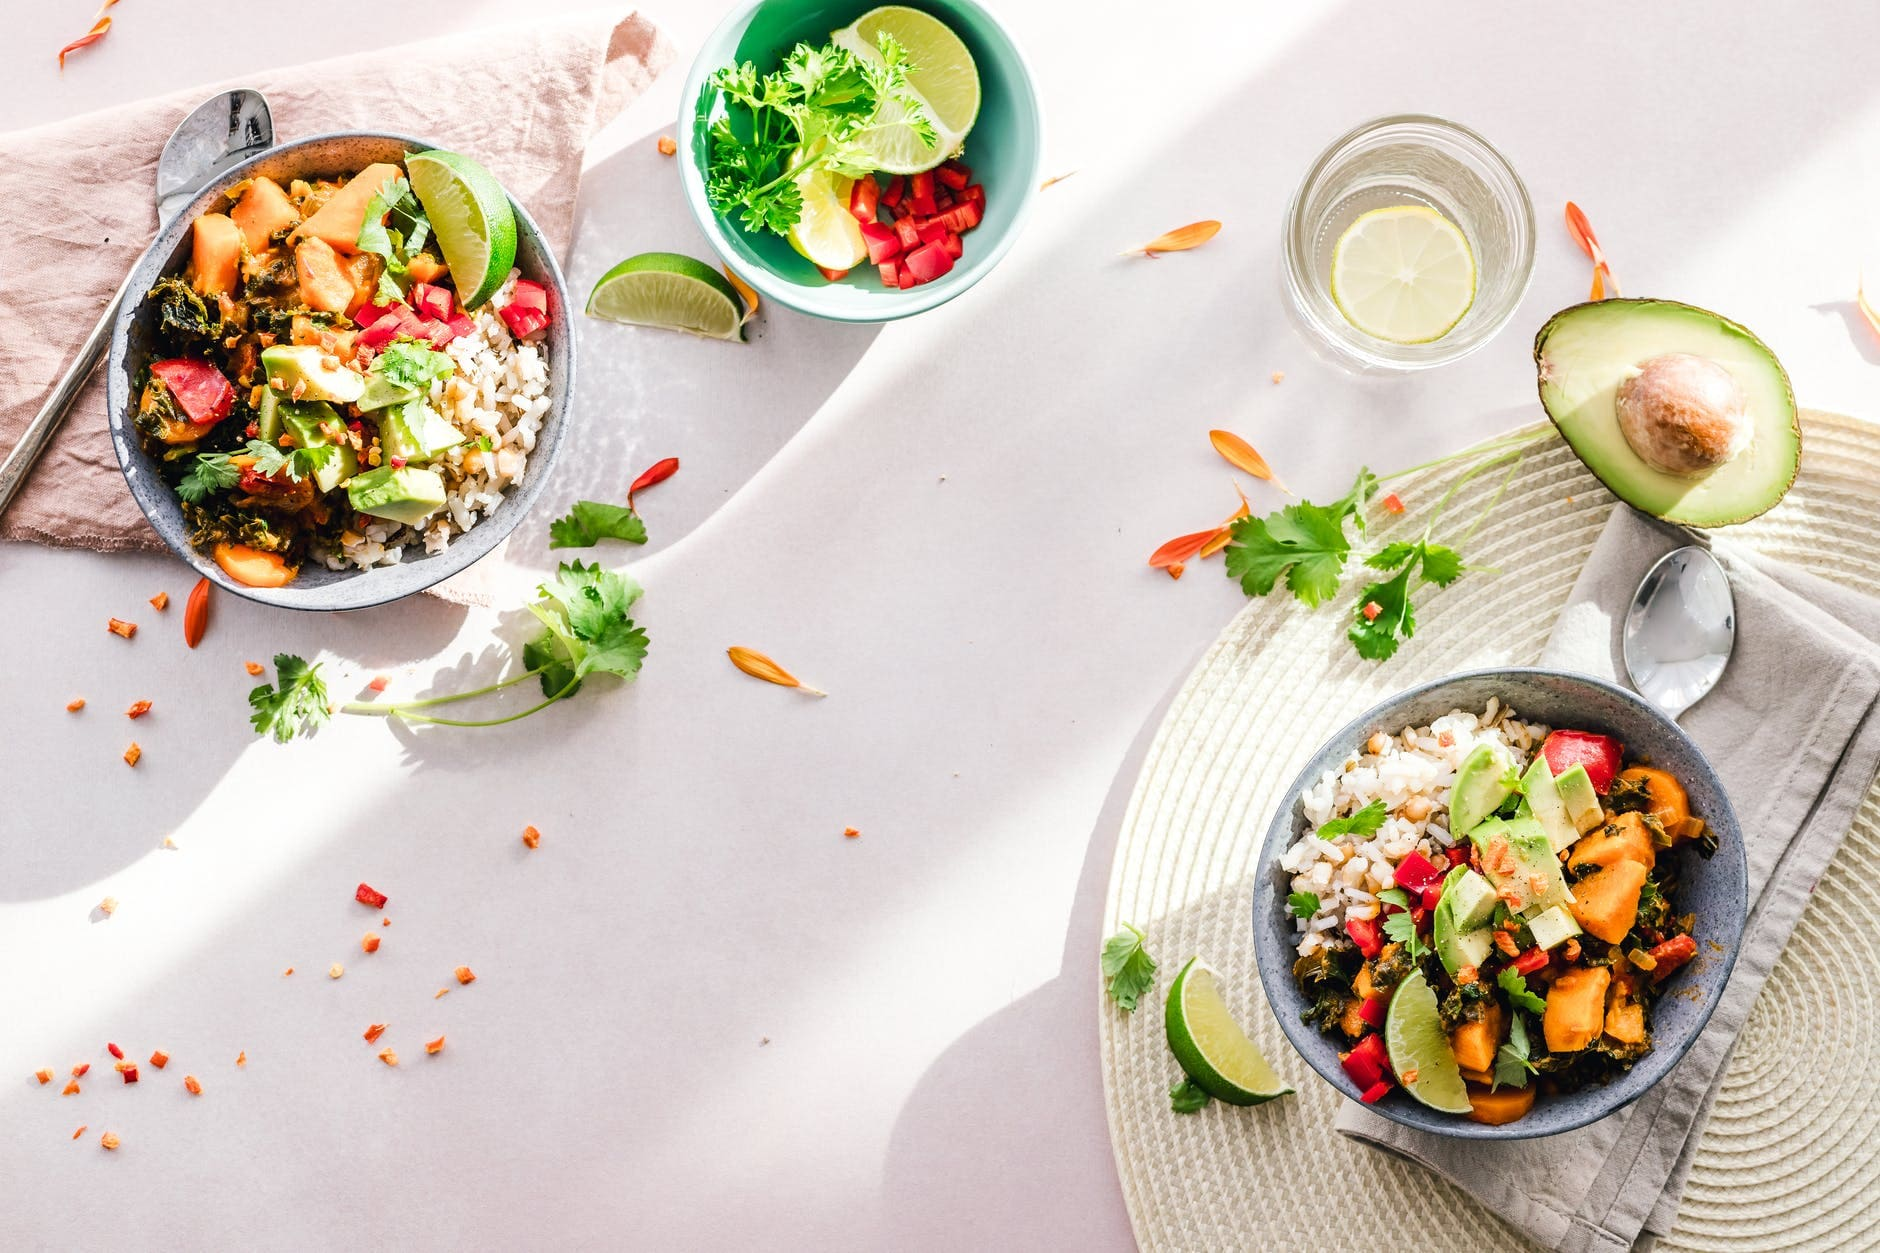 How to make Turkish leek salad